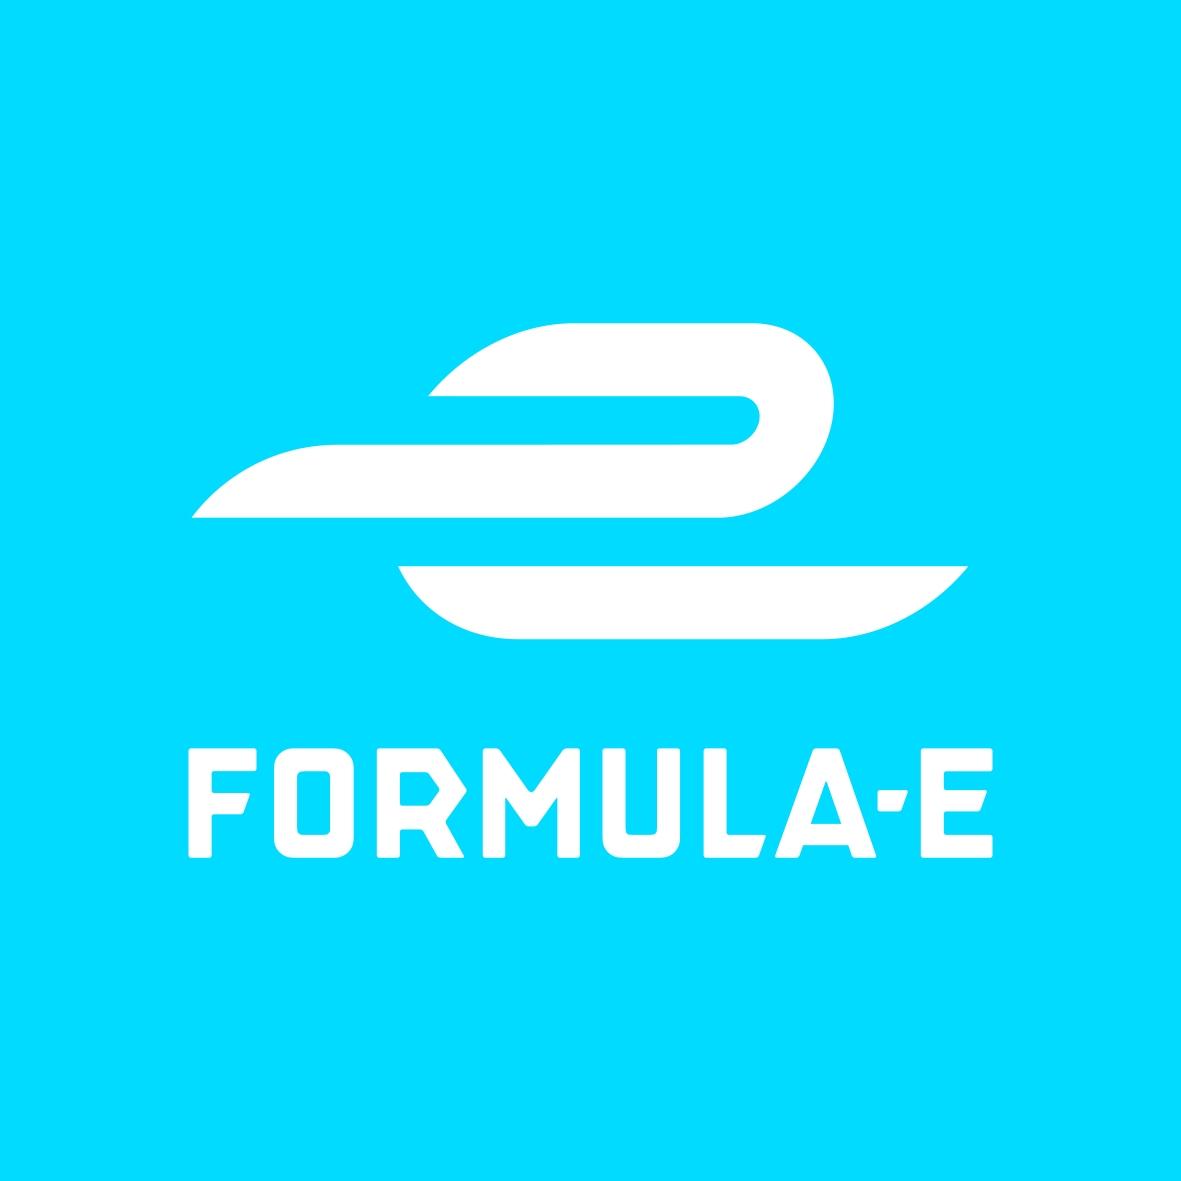 Formula E - Wikipedia throughout Formula E 2019 - 2020 Calendar